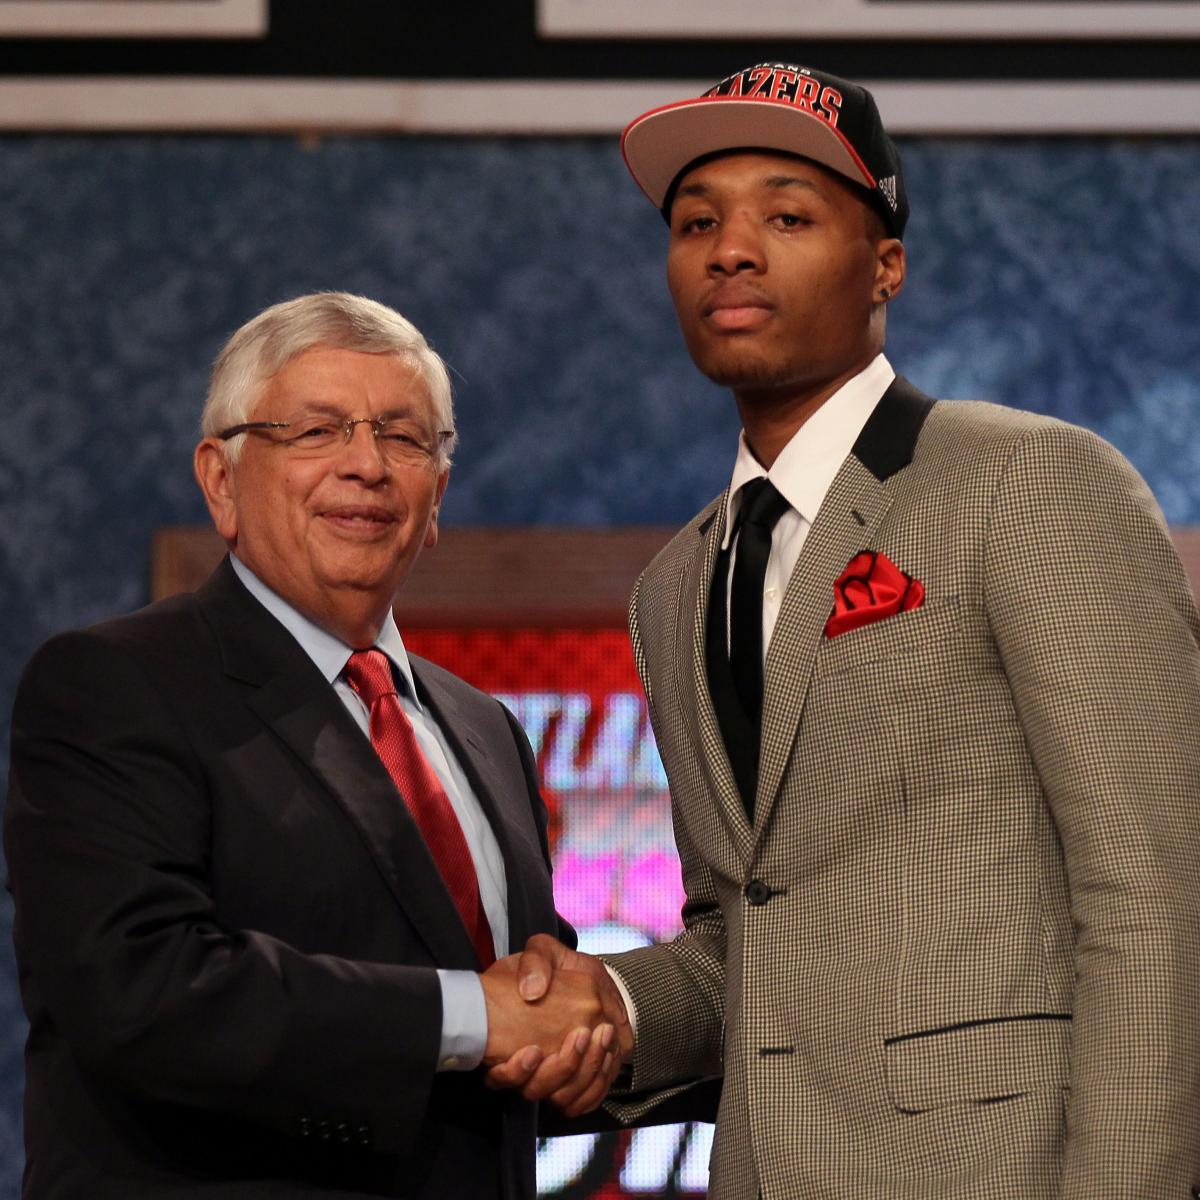 Portland Trail Blazers Worst Draft Picks: The Top 5 Best And Worst Portland Trail Blazers Draft